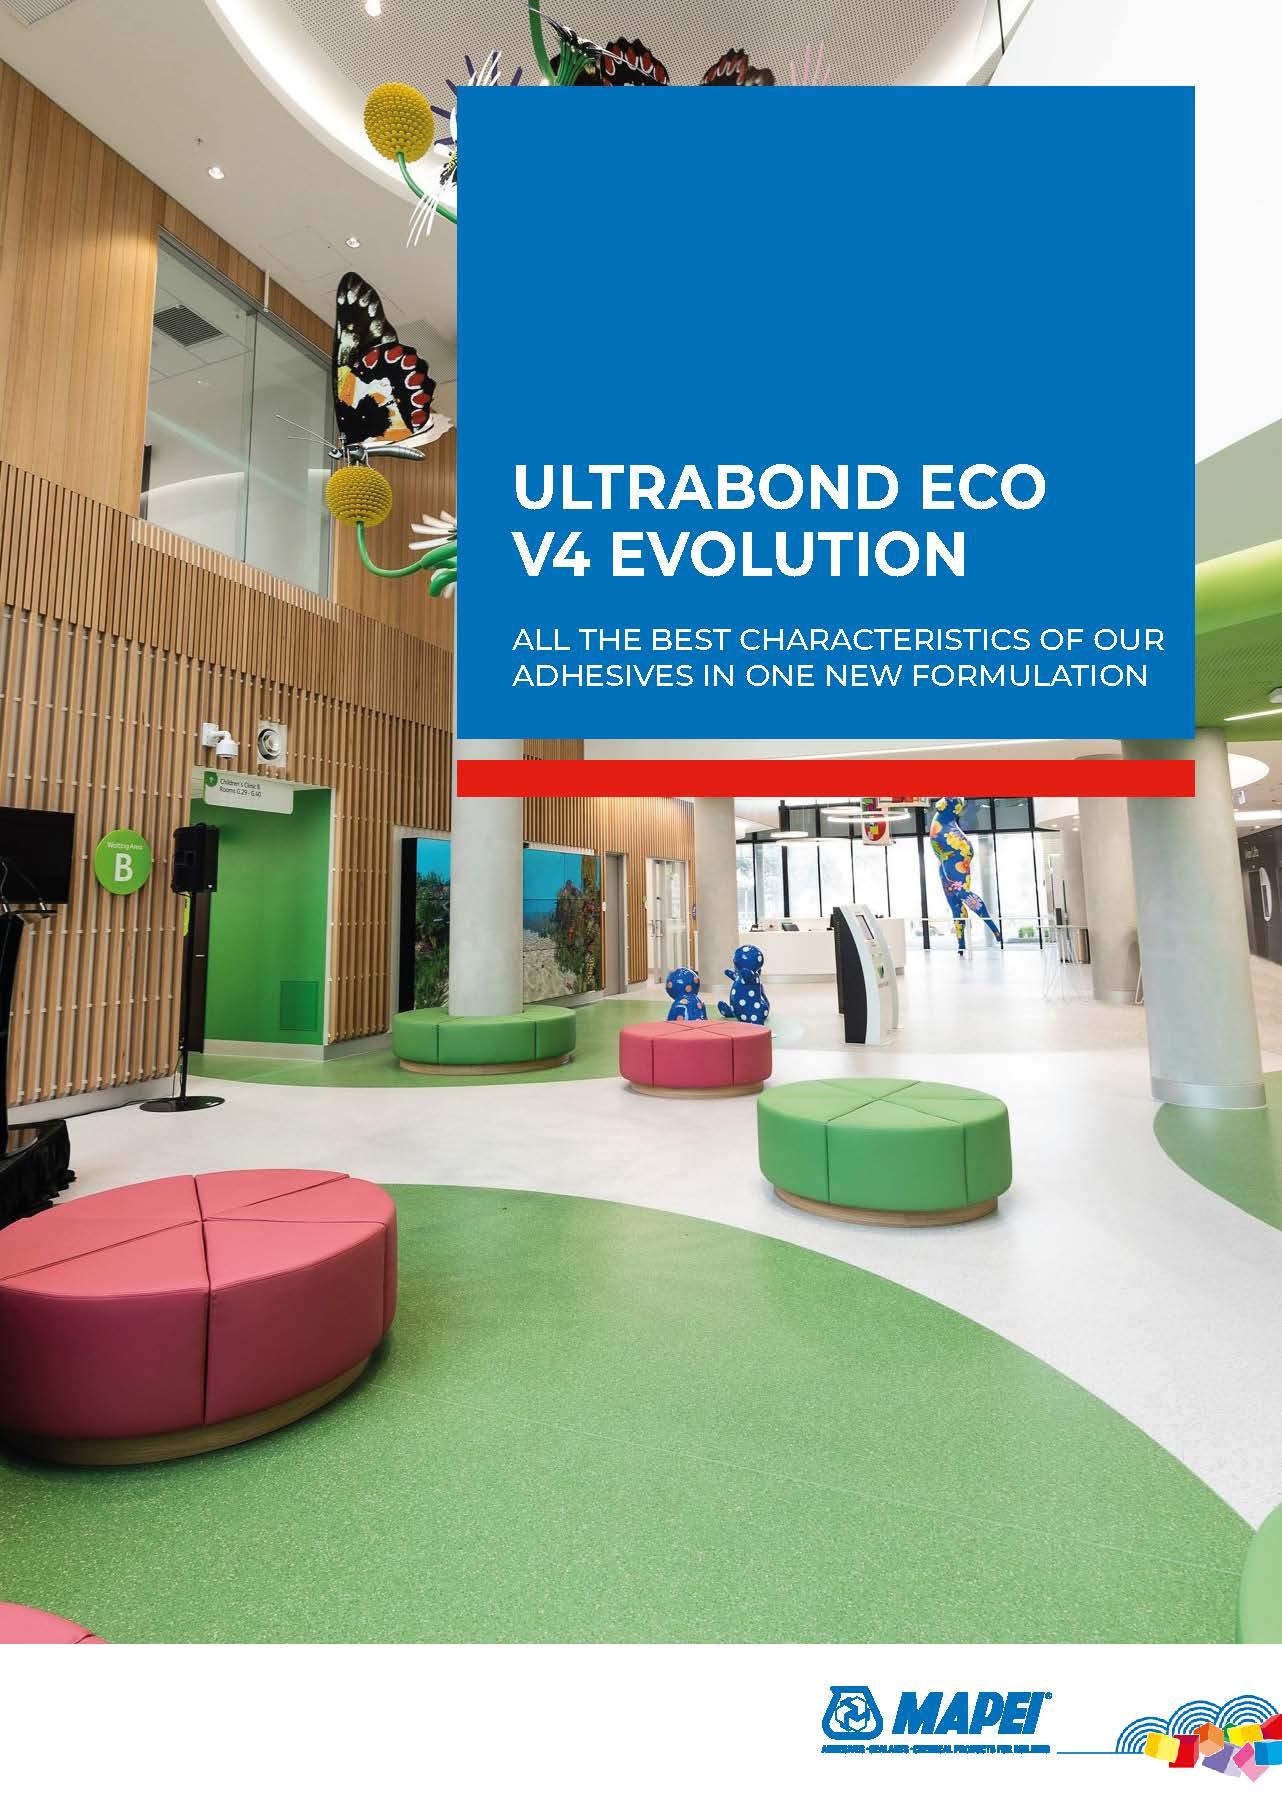 ULTRABOND ECO V4 EVOLUTION